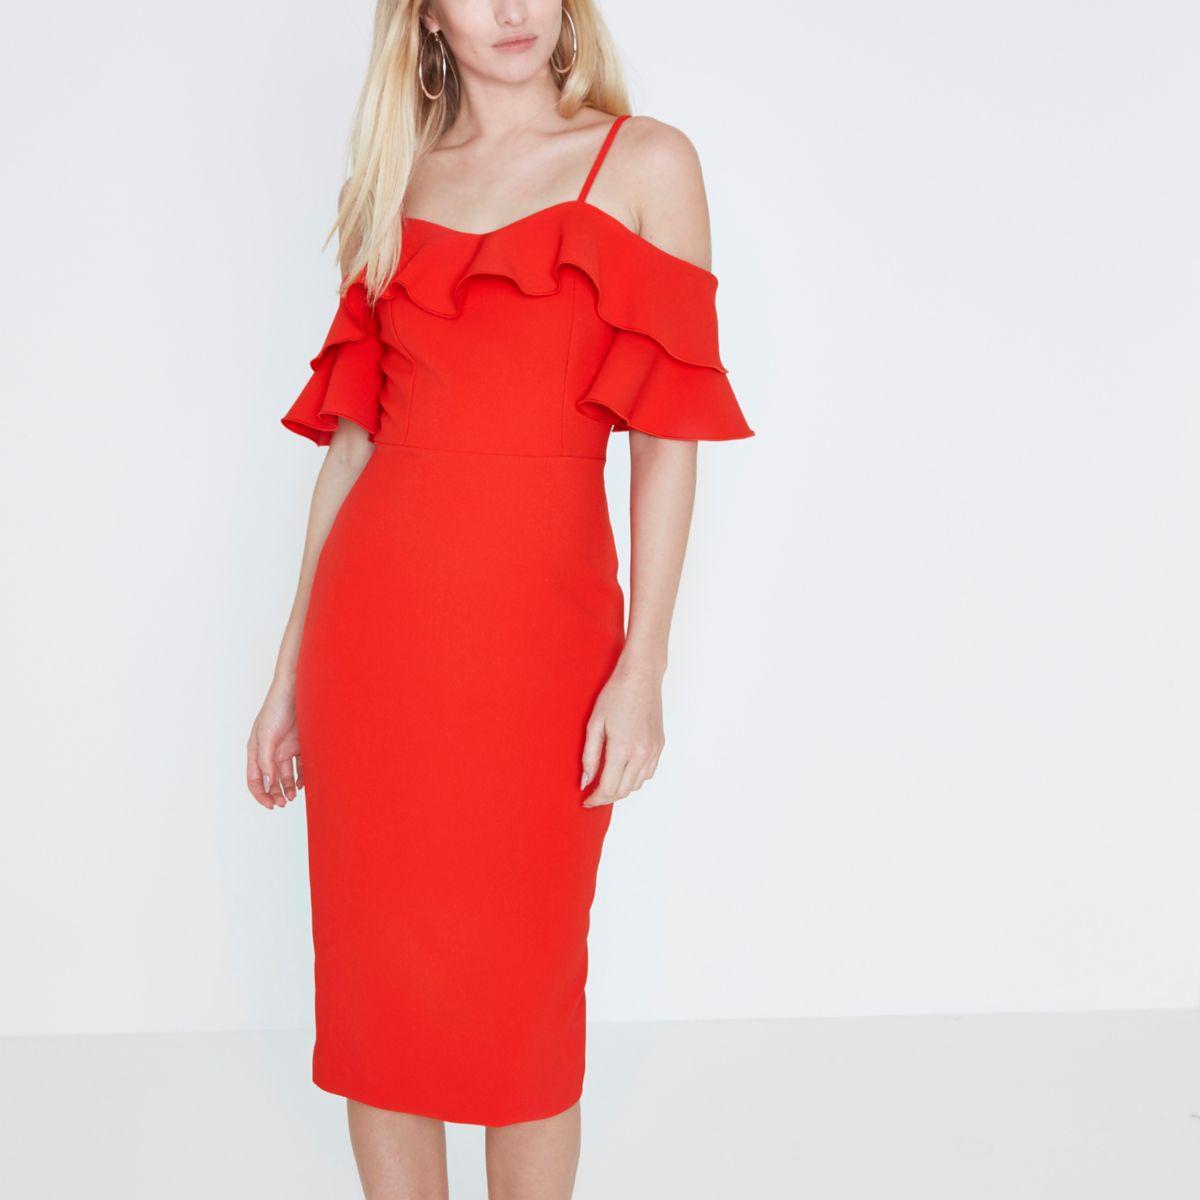 River Island Red Jumper Dress